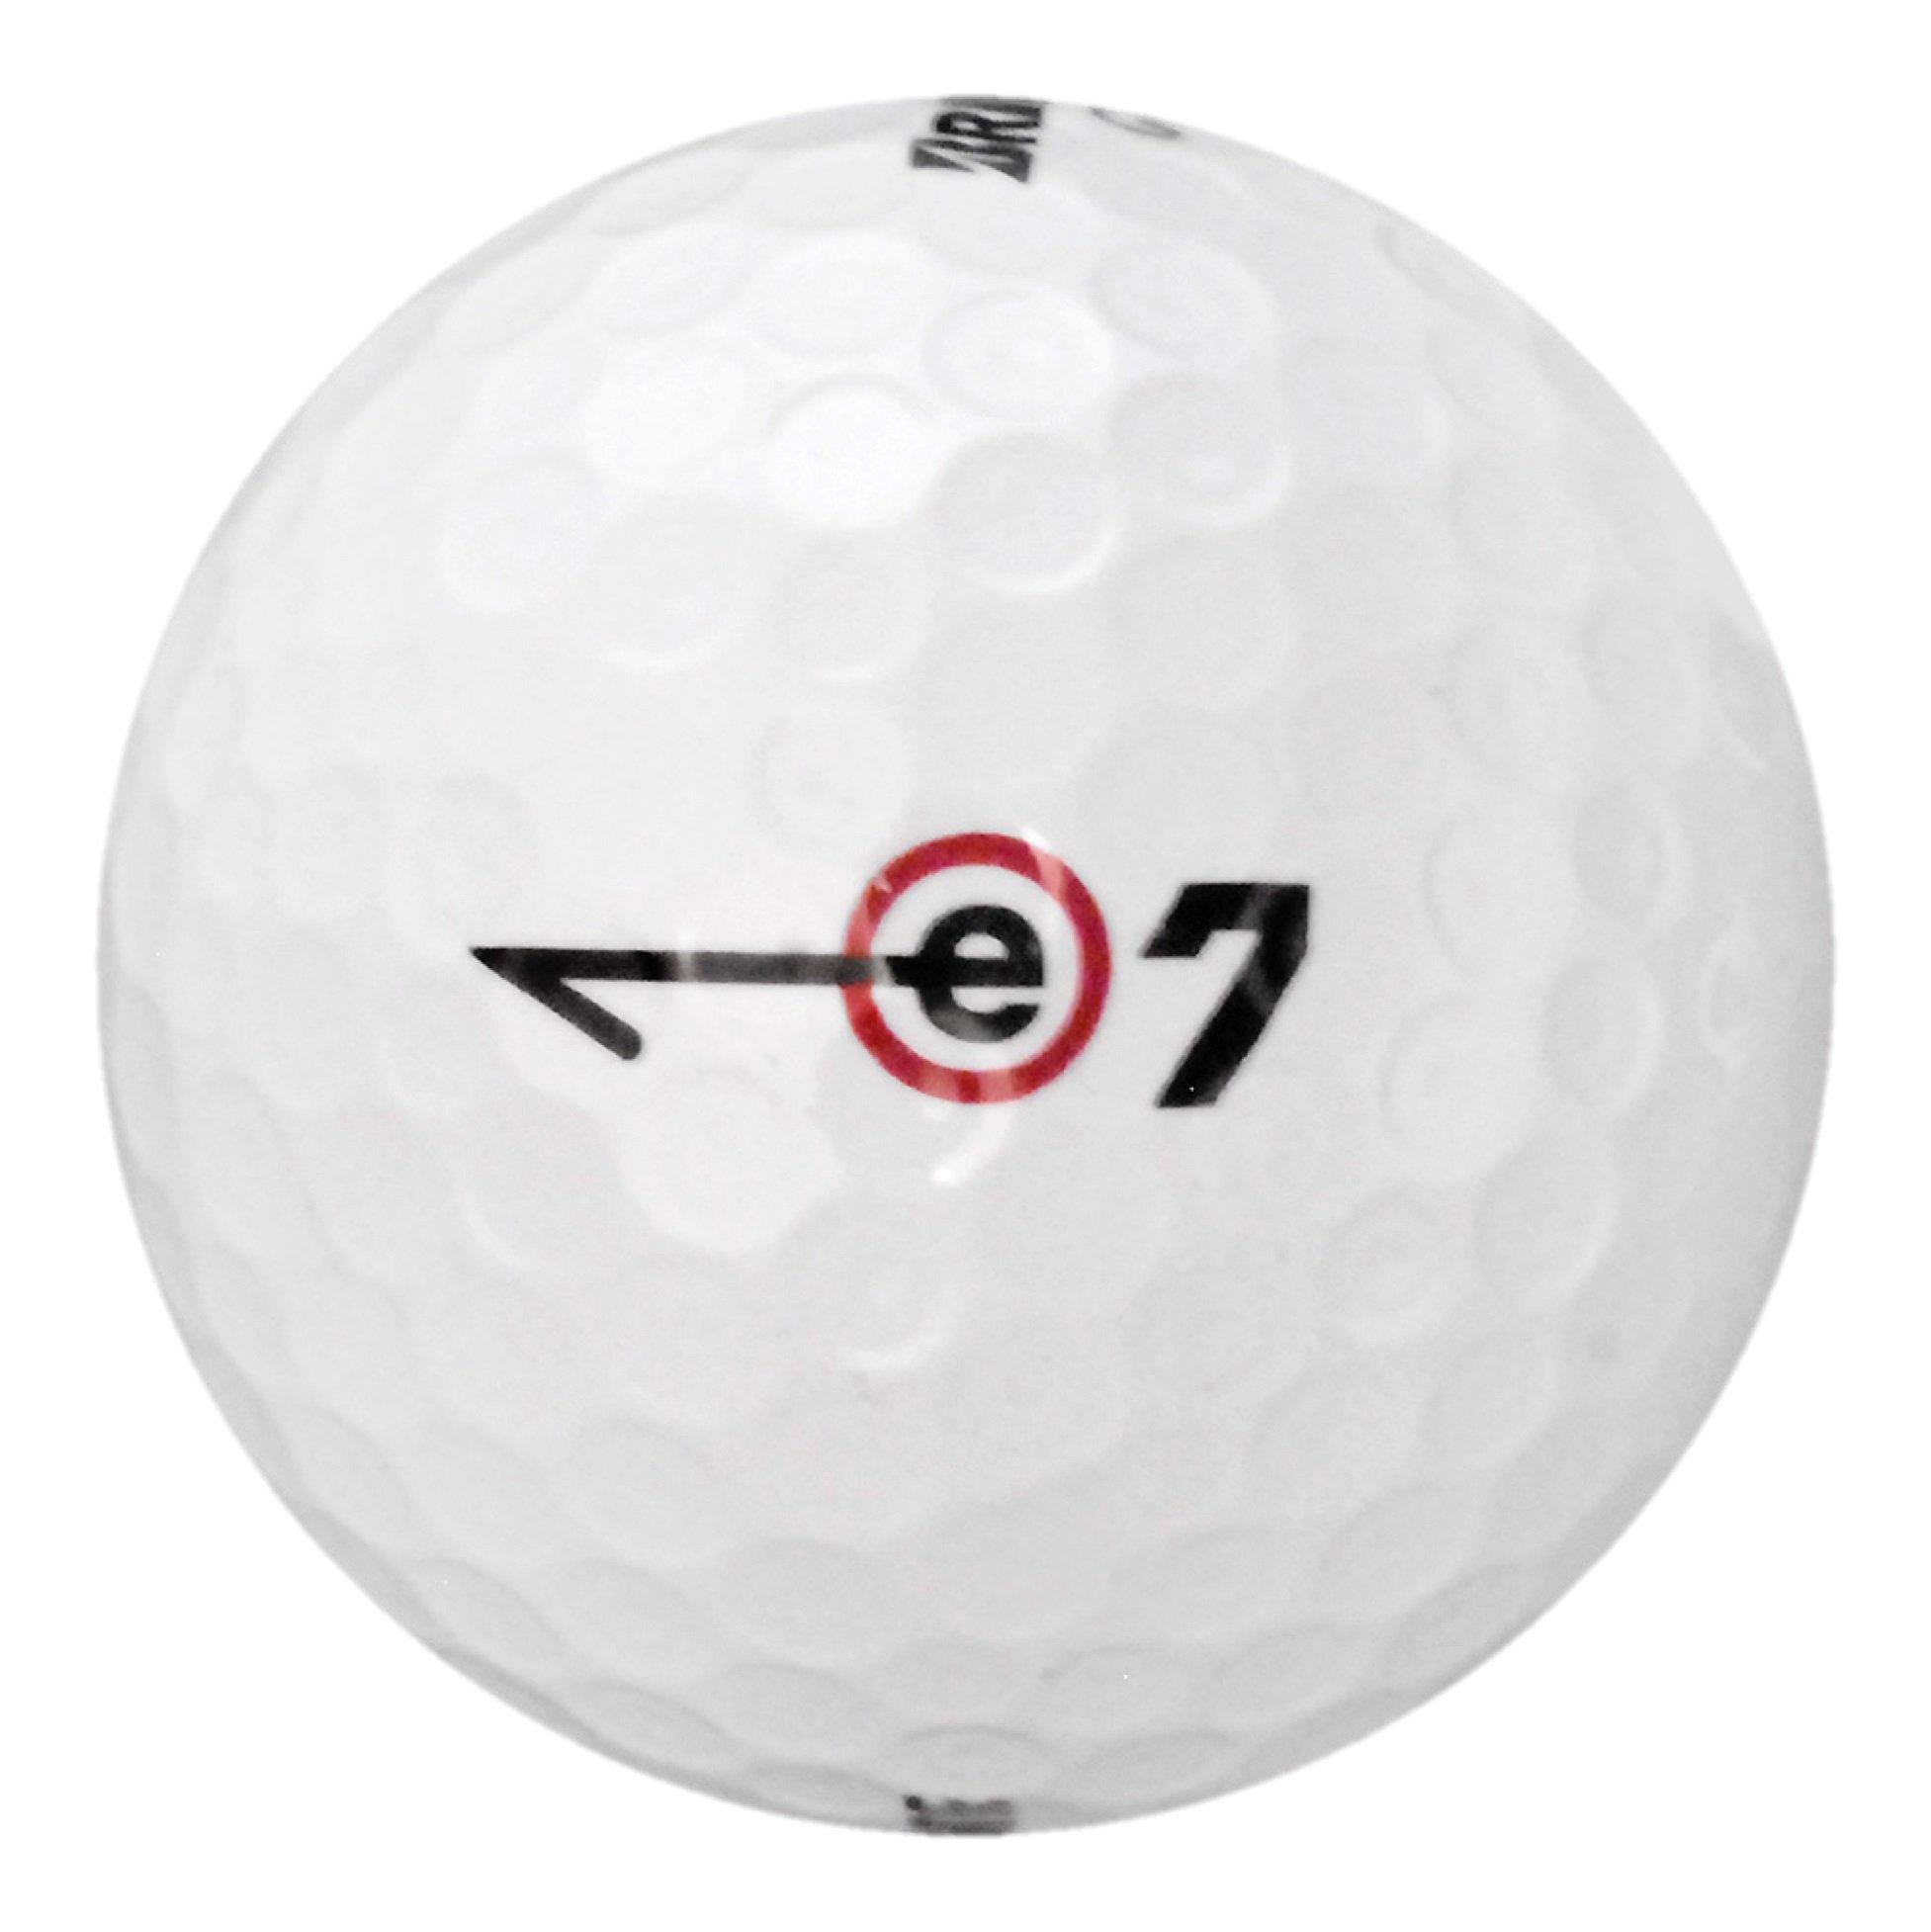 72 Bridgestone E7 5A/AAAAA Best Quality Golf Balls